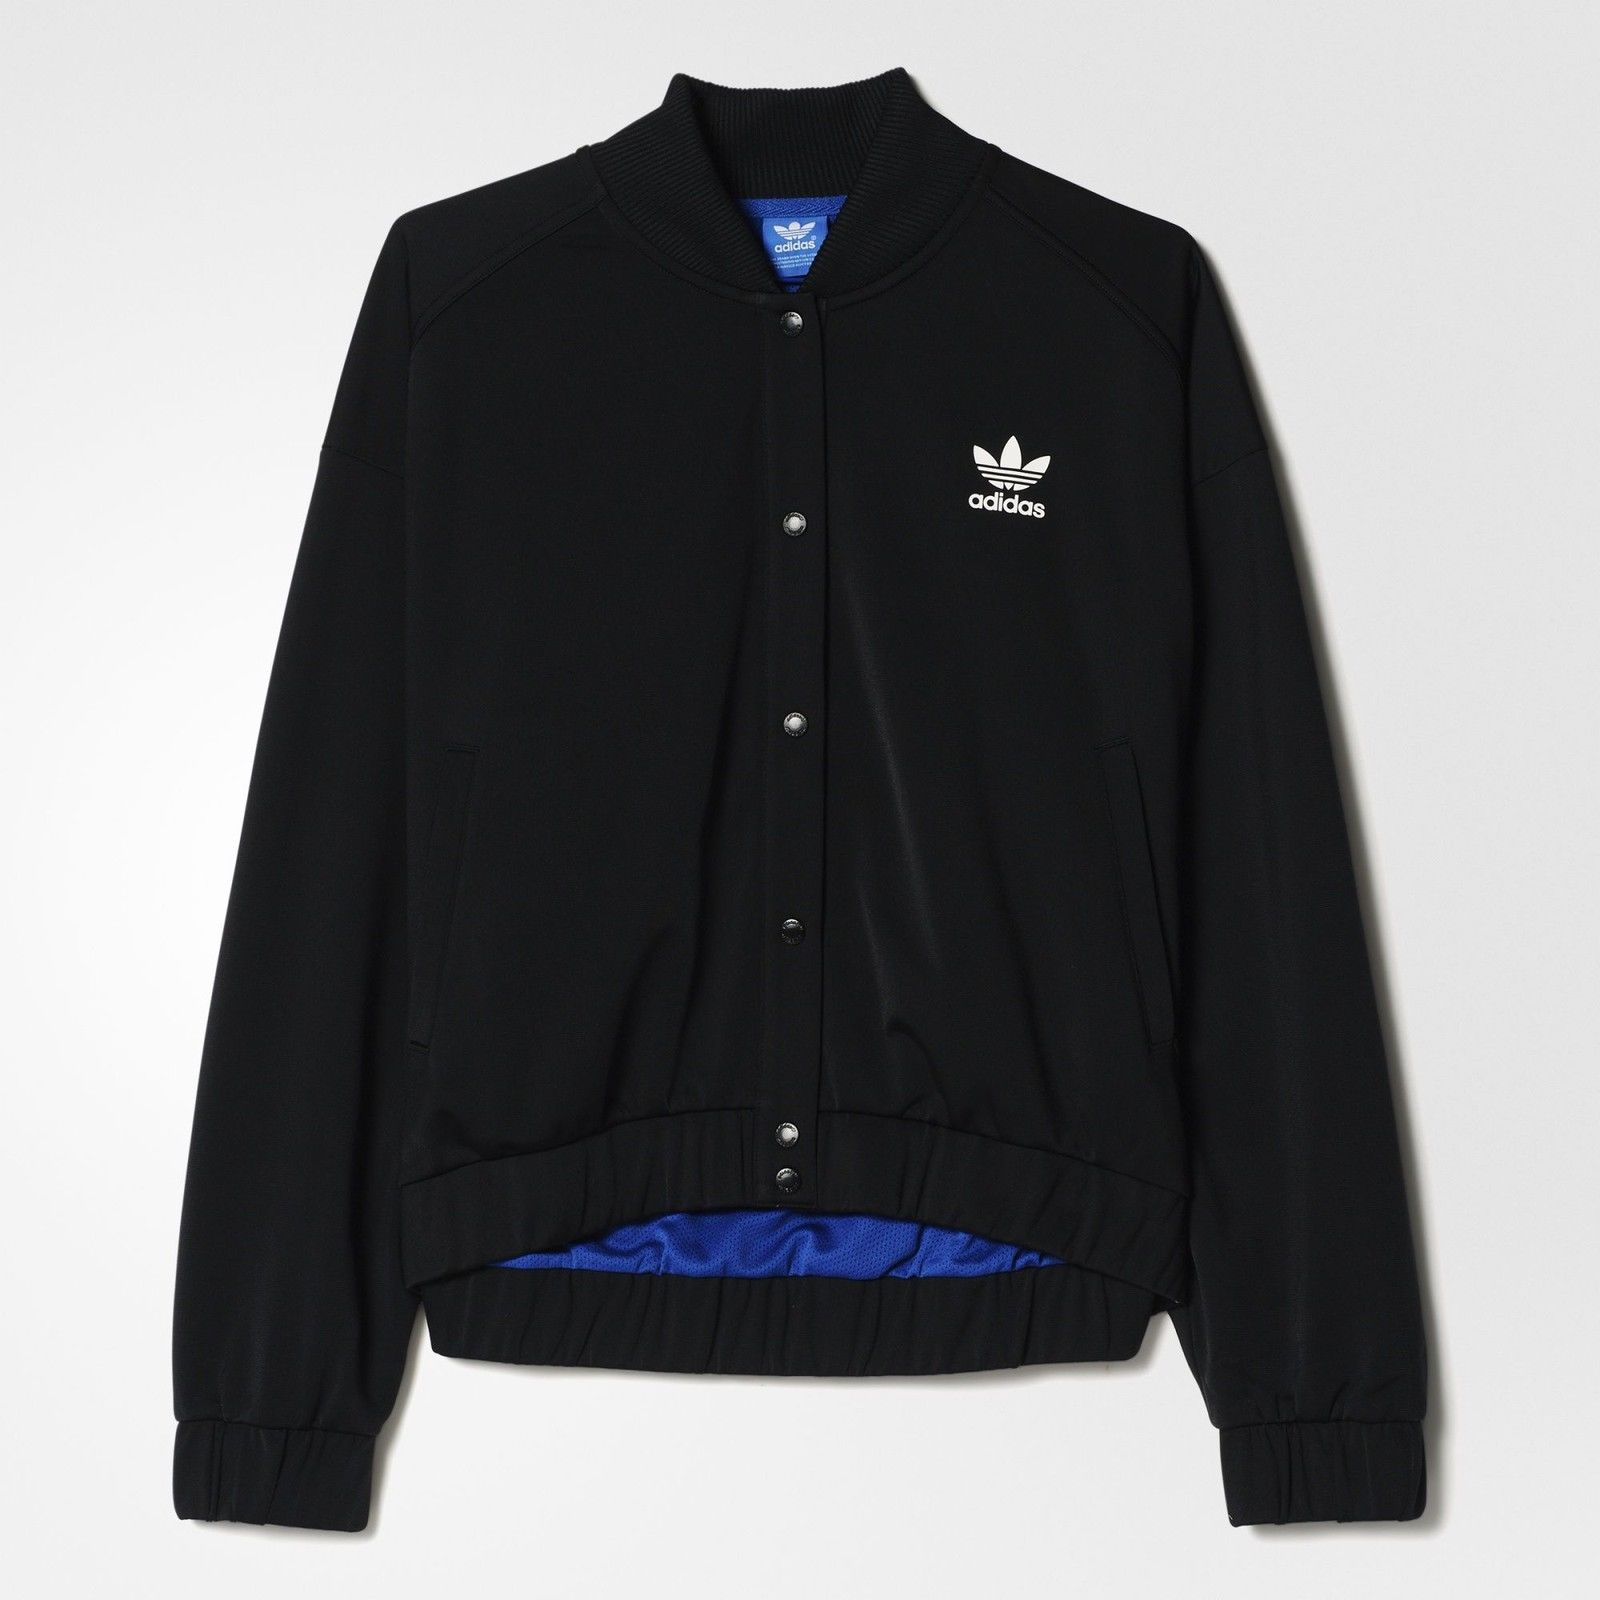 Adidas originals hoodie Zeppy.io